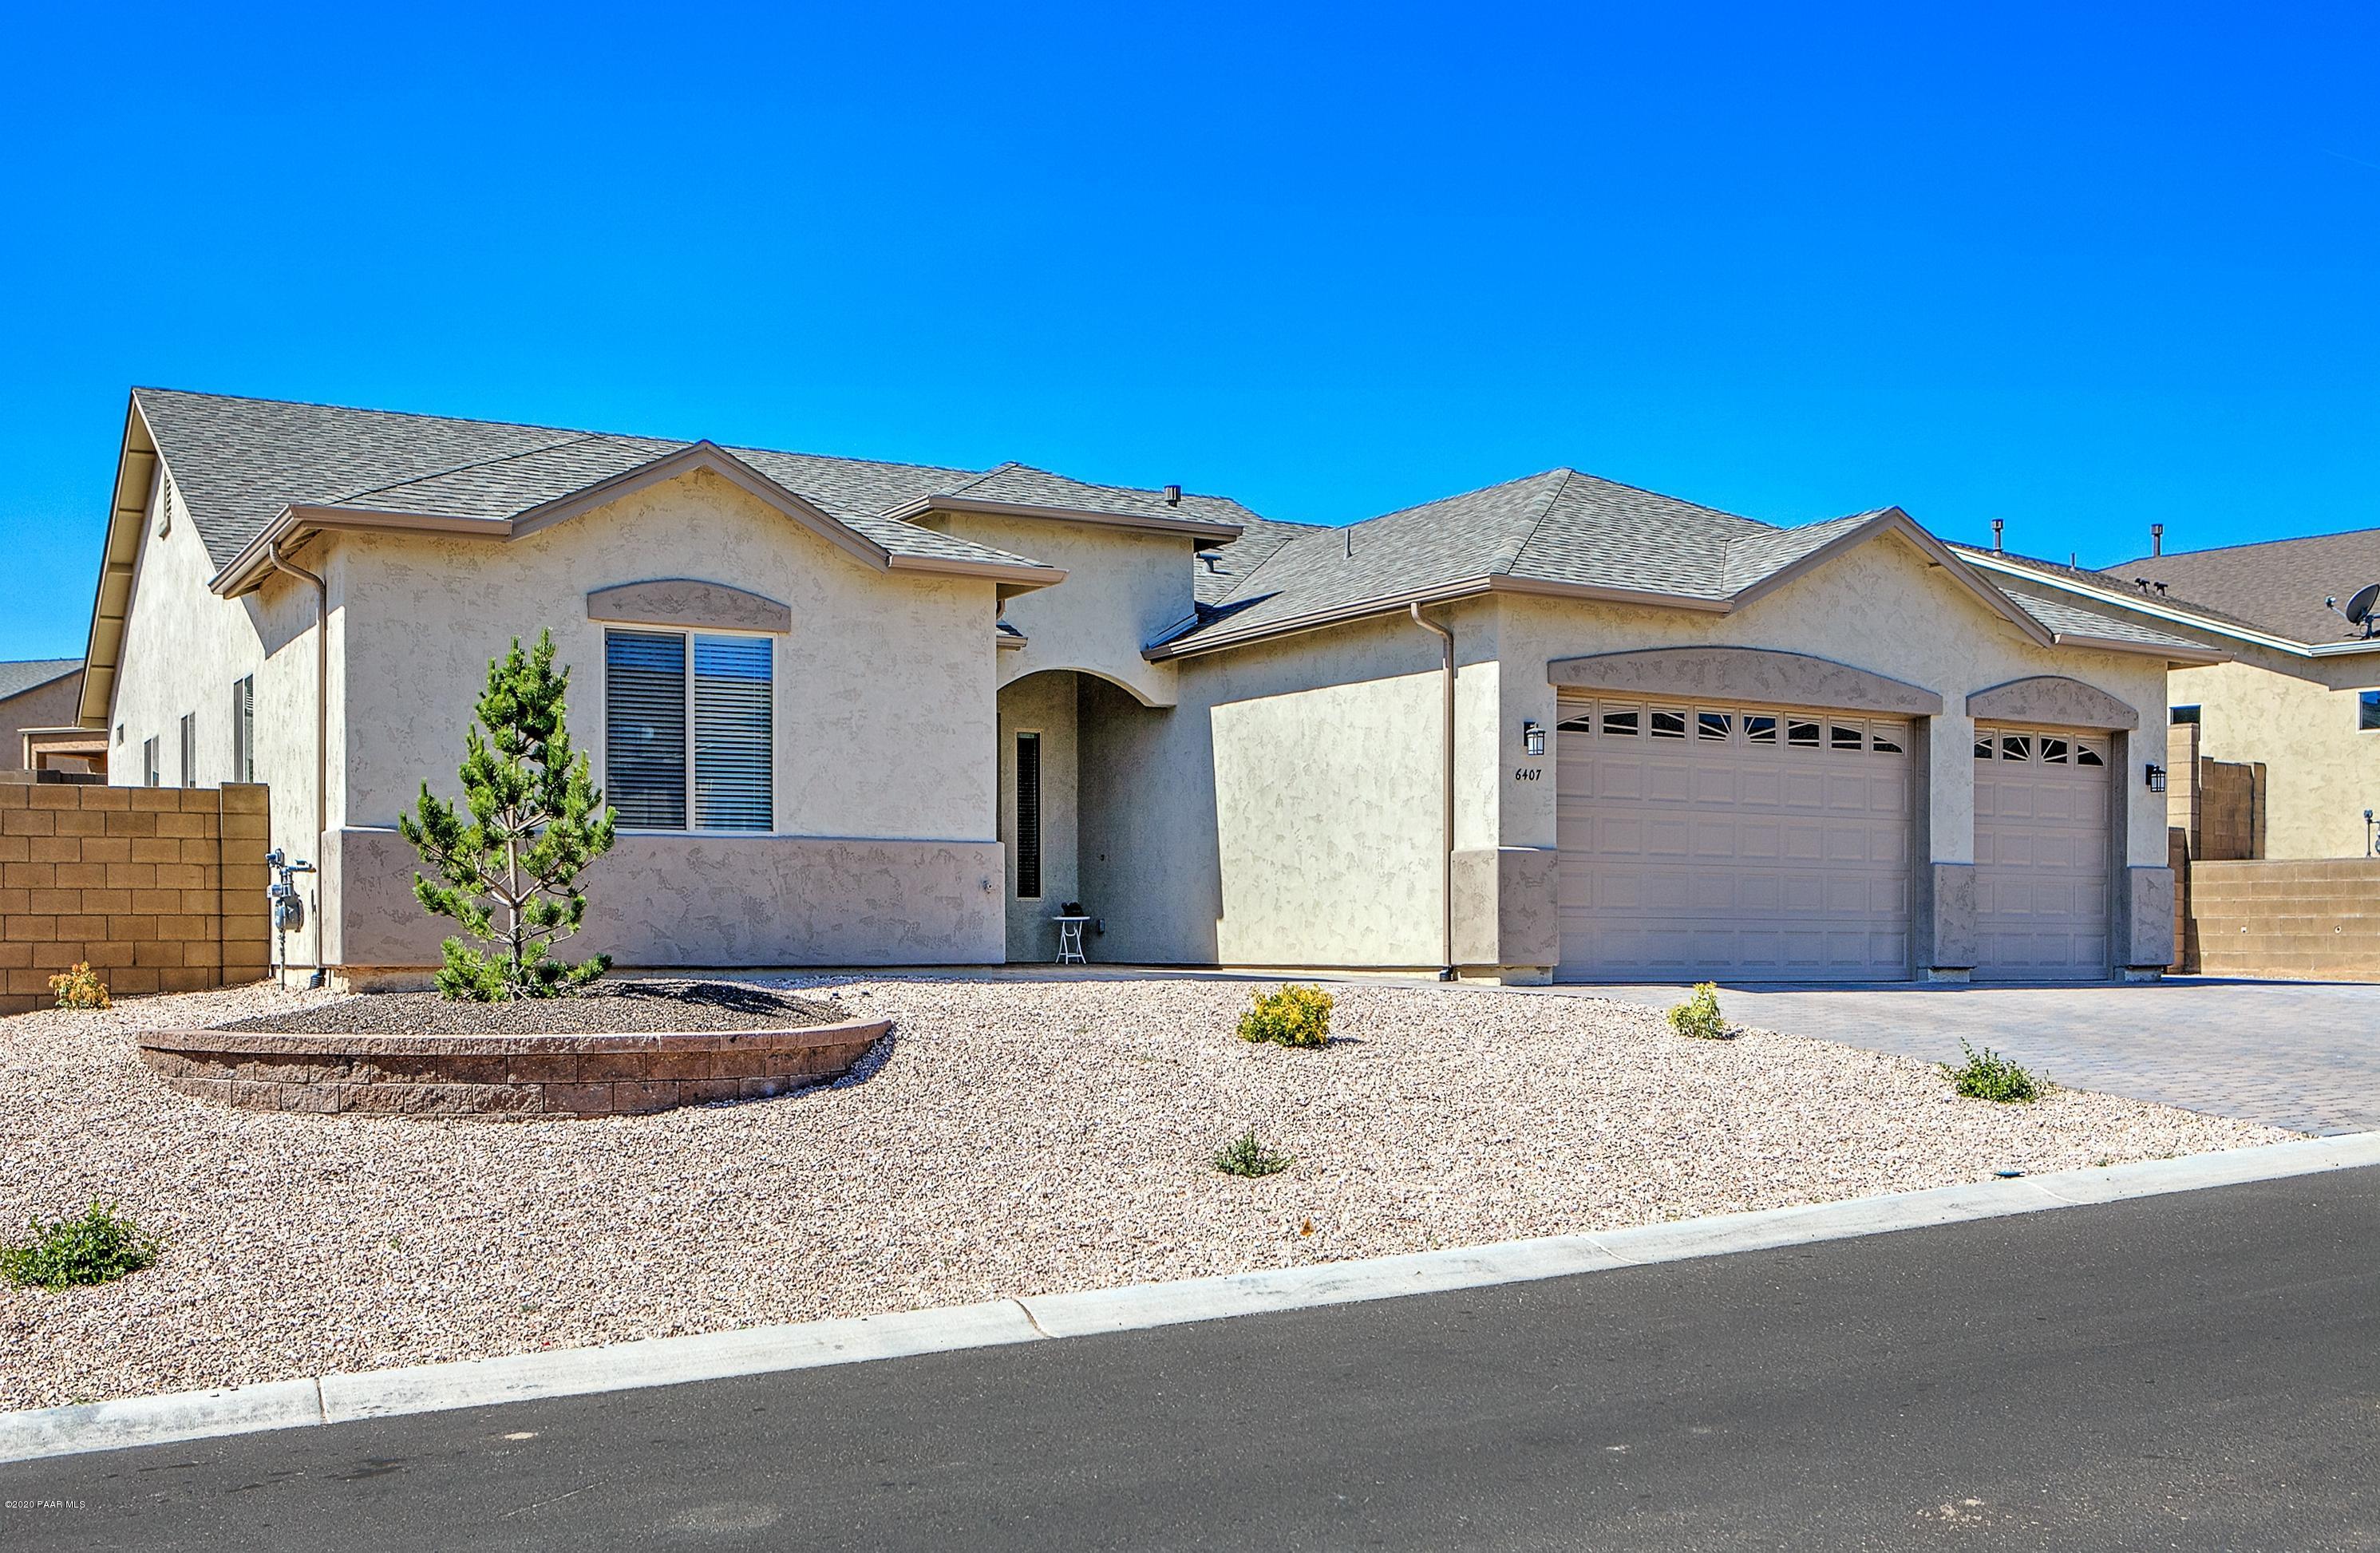 Photo of 6407 Sutton, Prescott Valley, AZ 86314